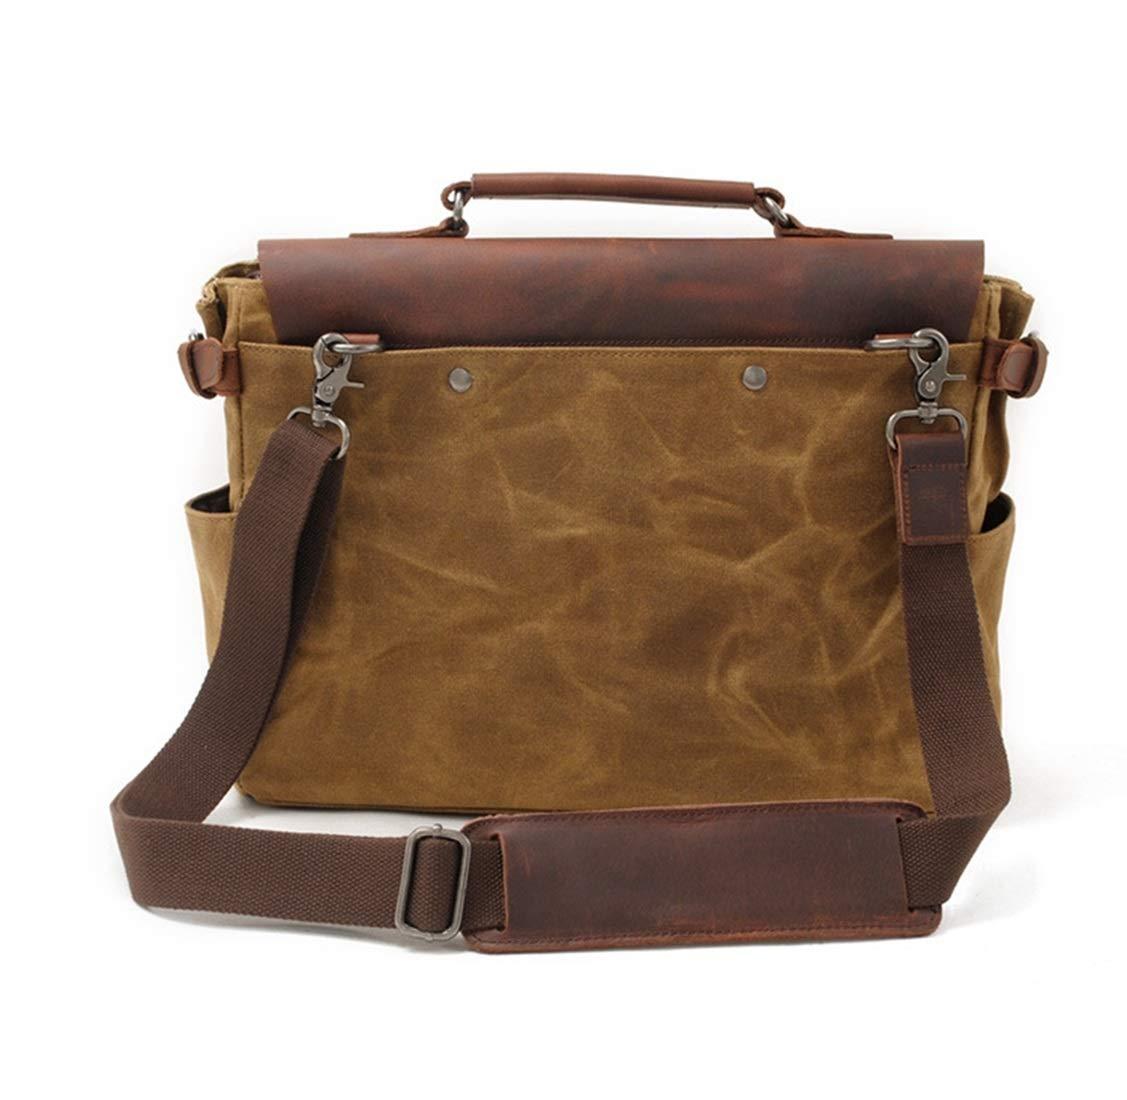 XIAMEND Retro Large Capacity Waterproof Camera Bag Canvas Shoulder Bag Messenger Bag Color : Dark Gray